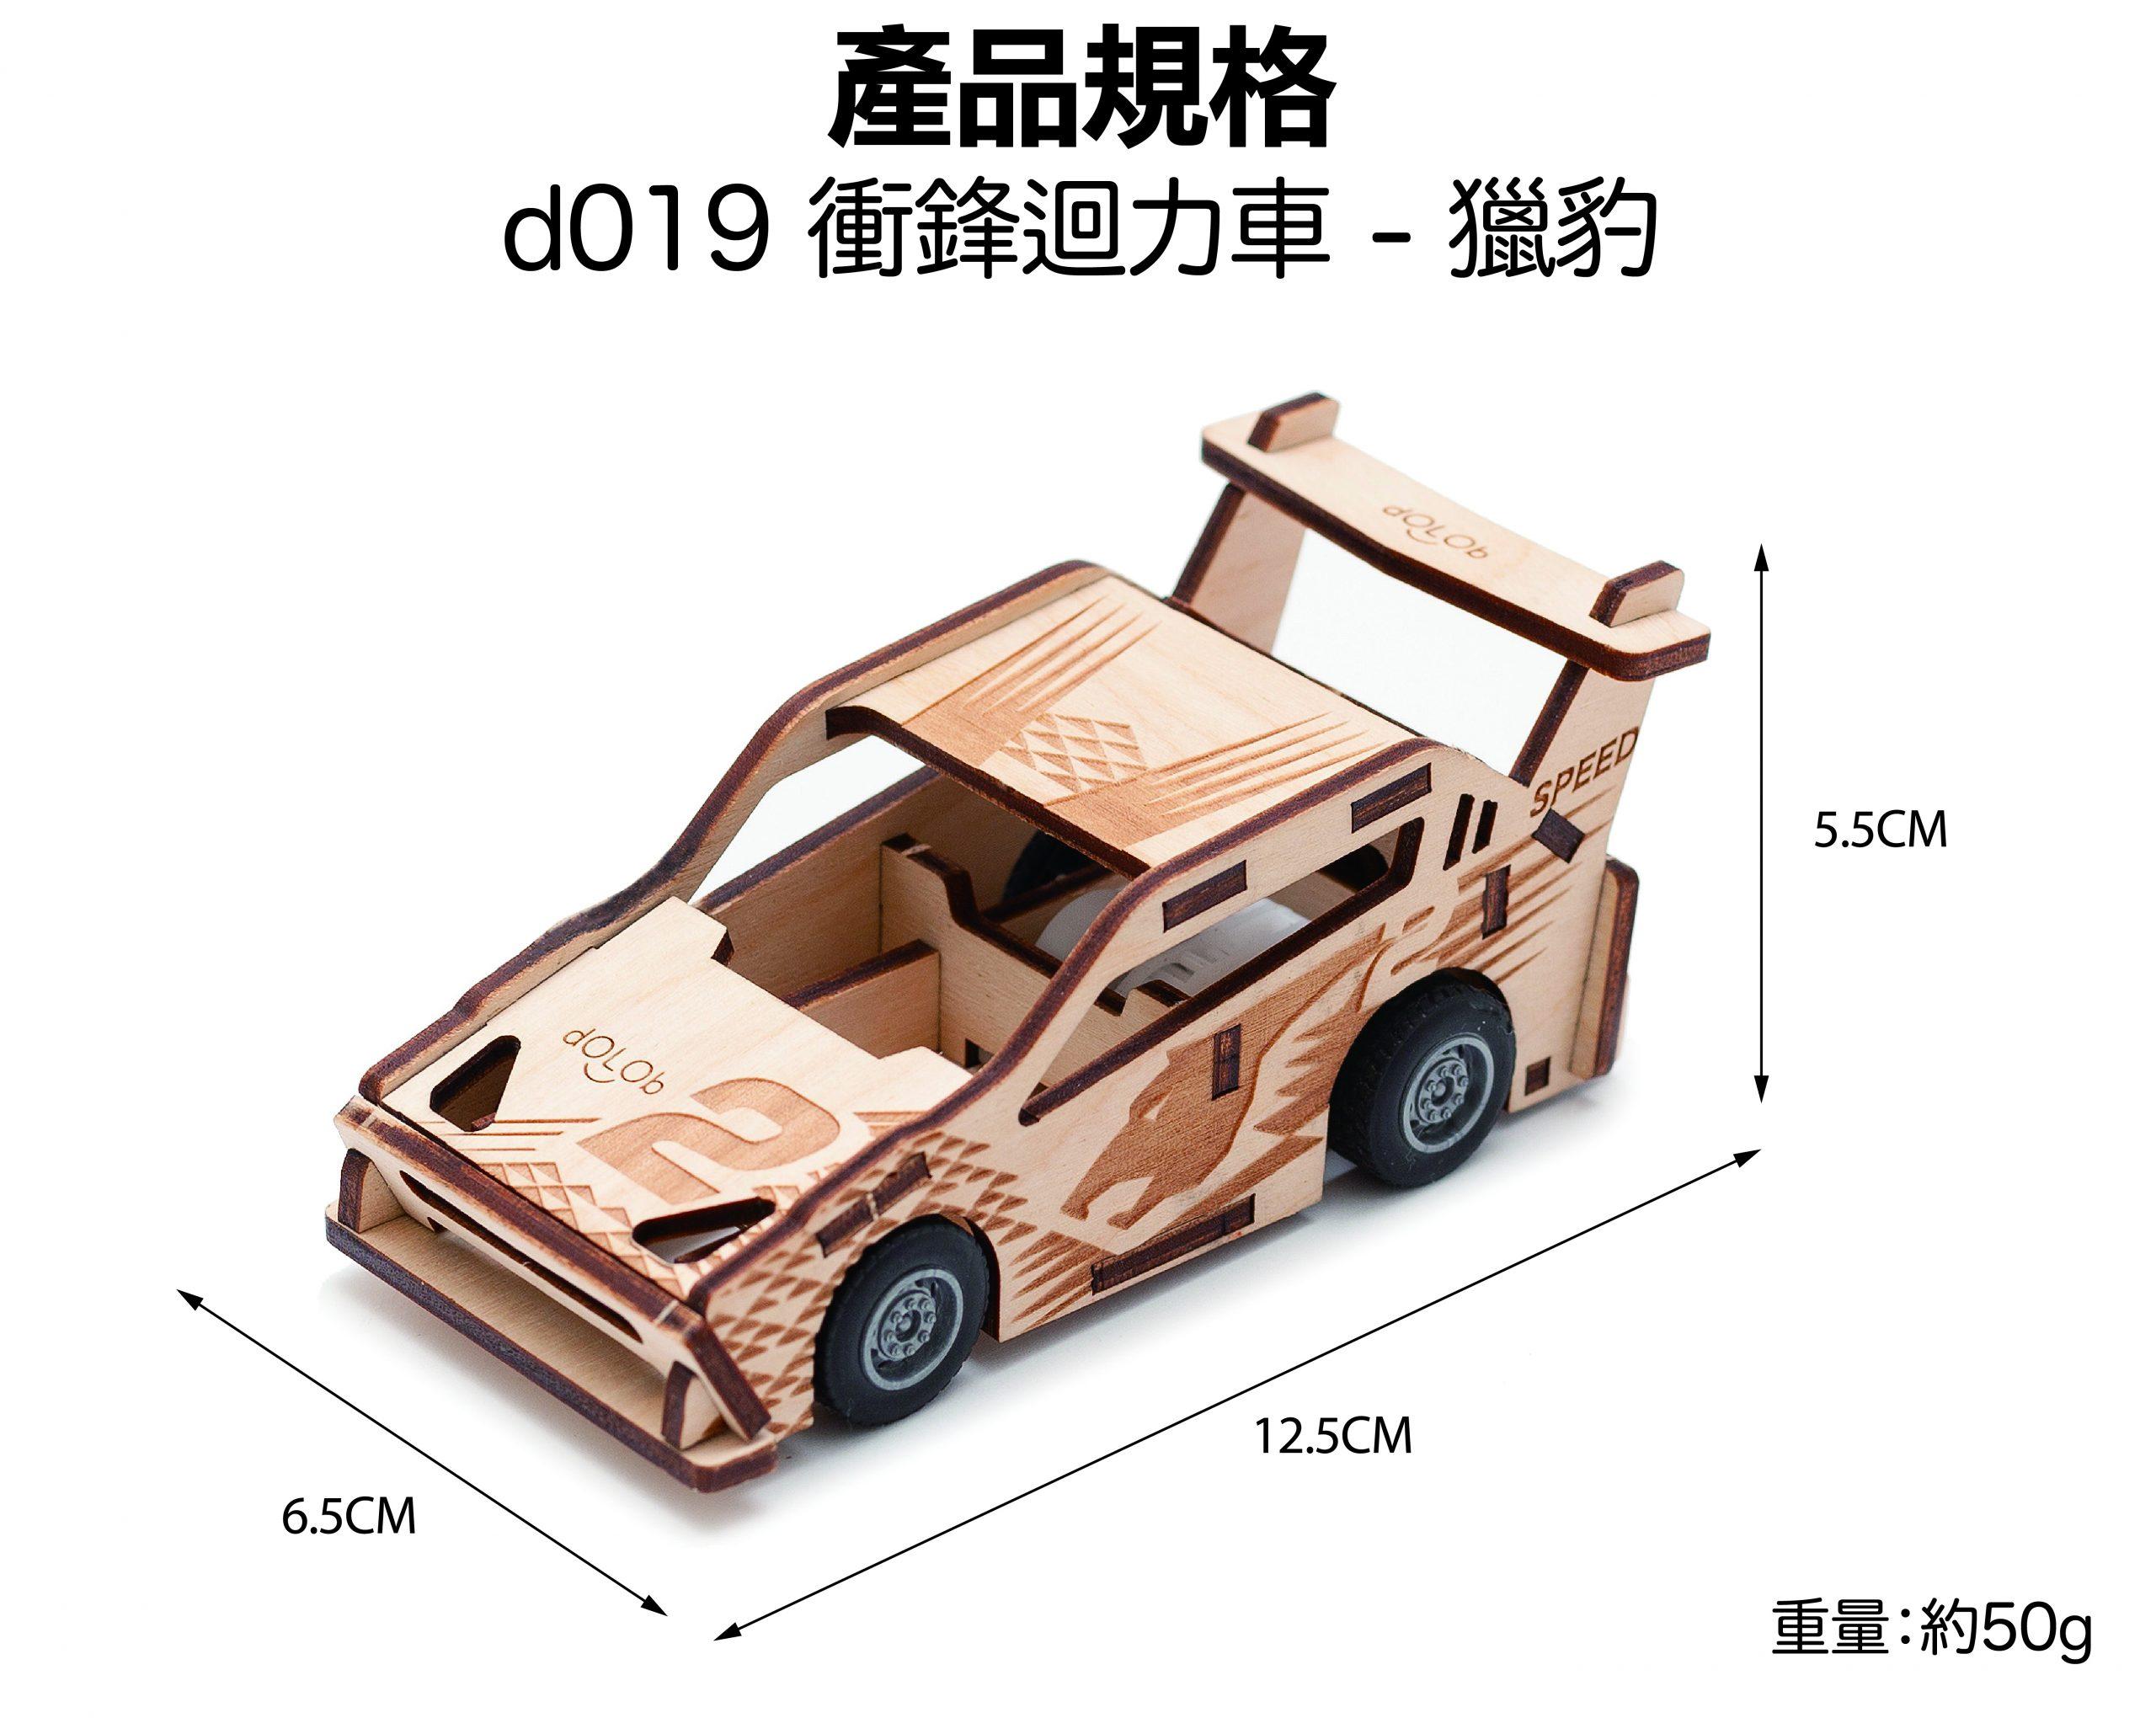 dolob 迴力車 d019規格尺寸